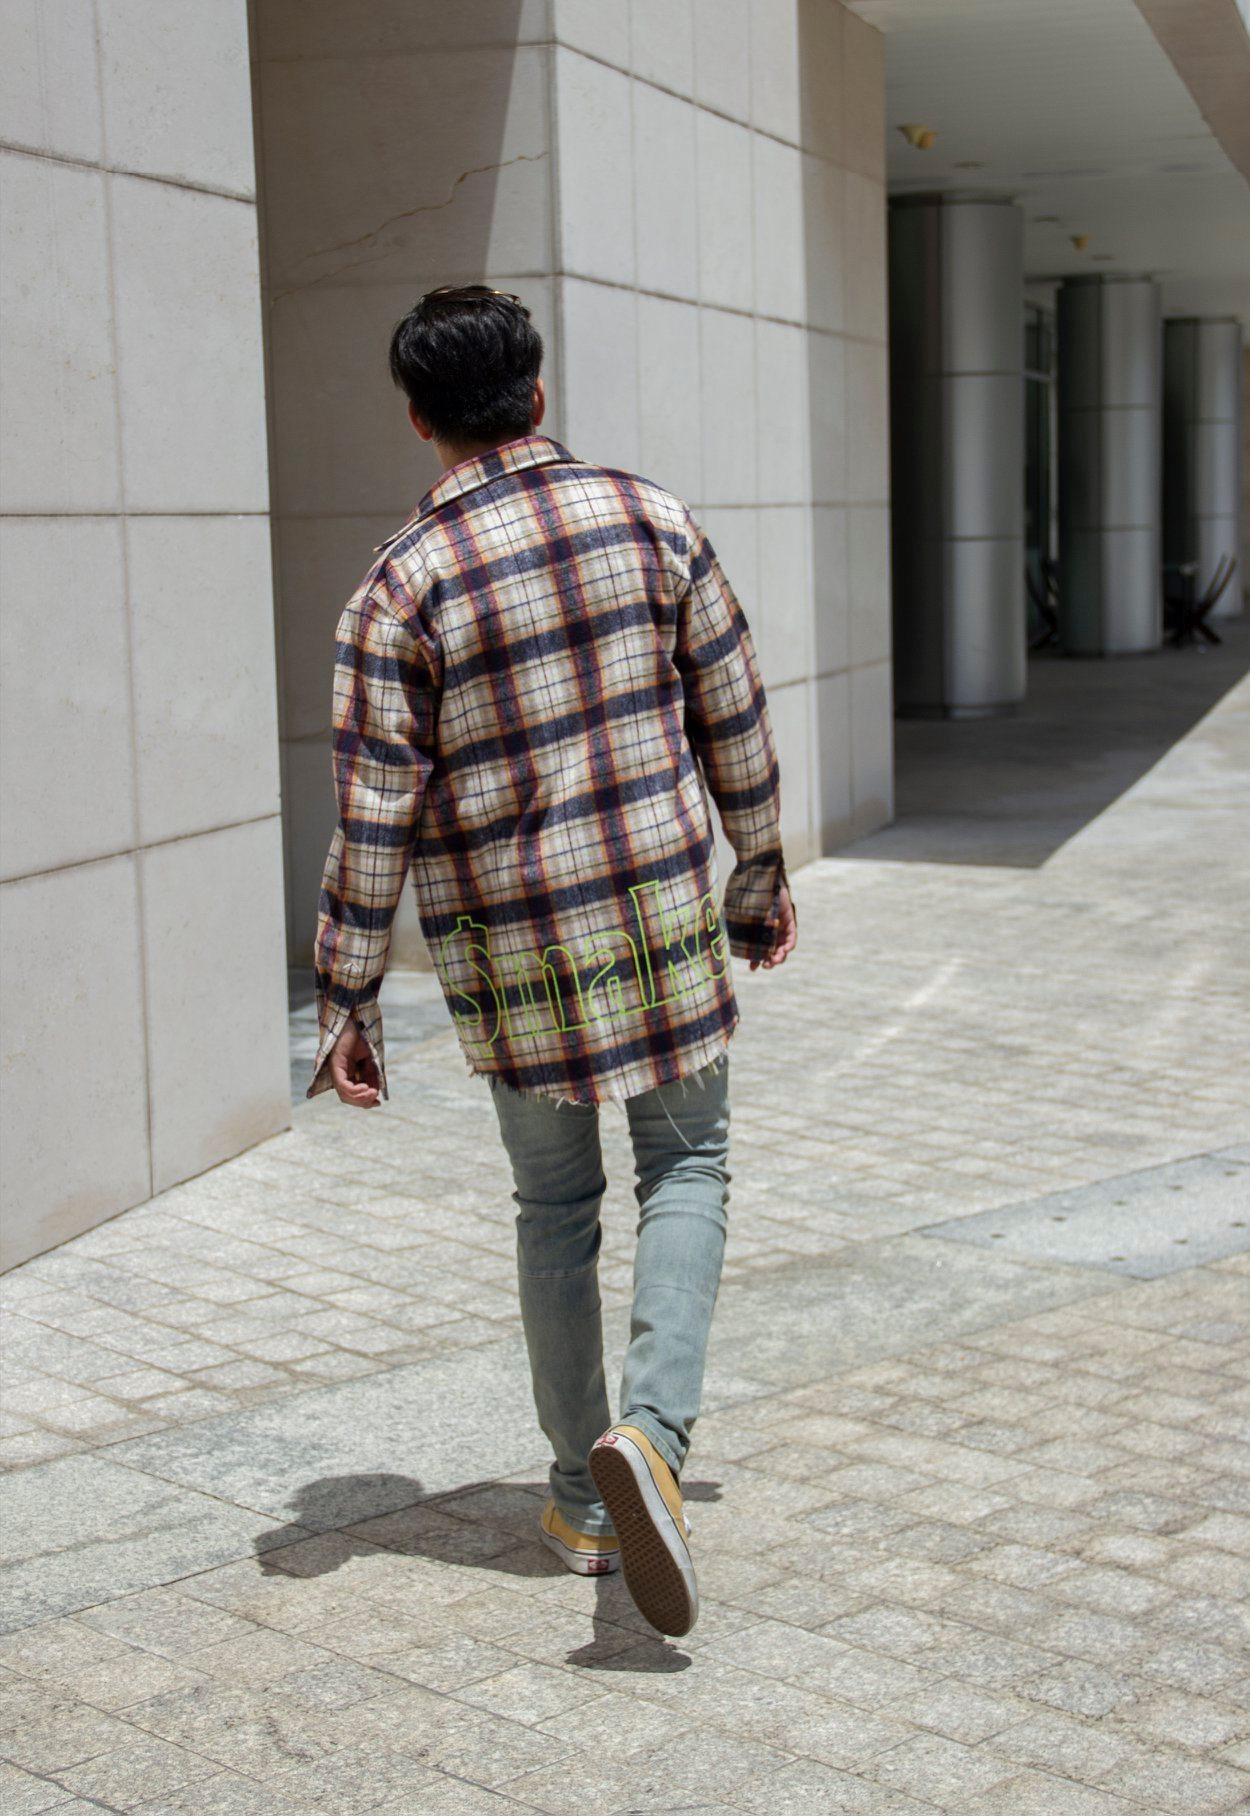 phoi do voi ao so mi flannel - maker